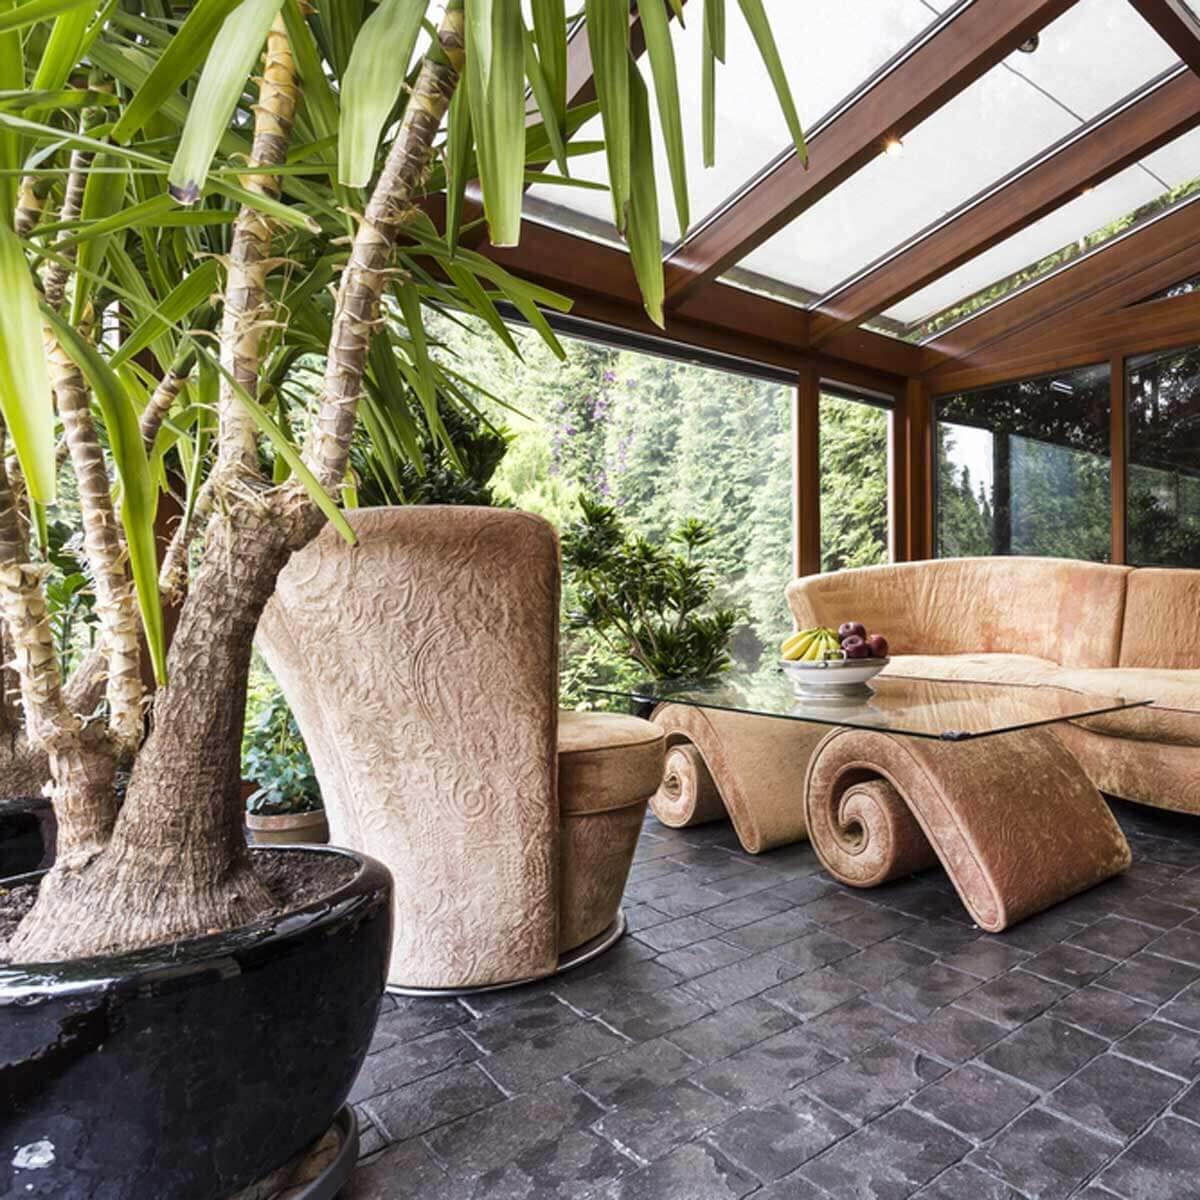 dfh13_shutterstock_656471947 tropical sun room patio